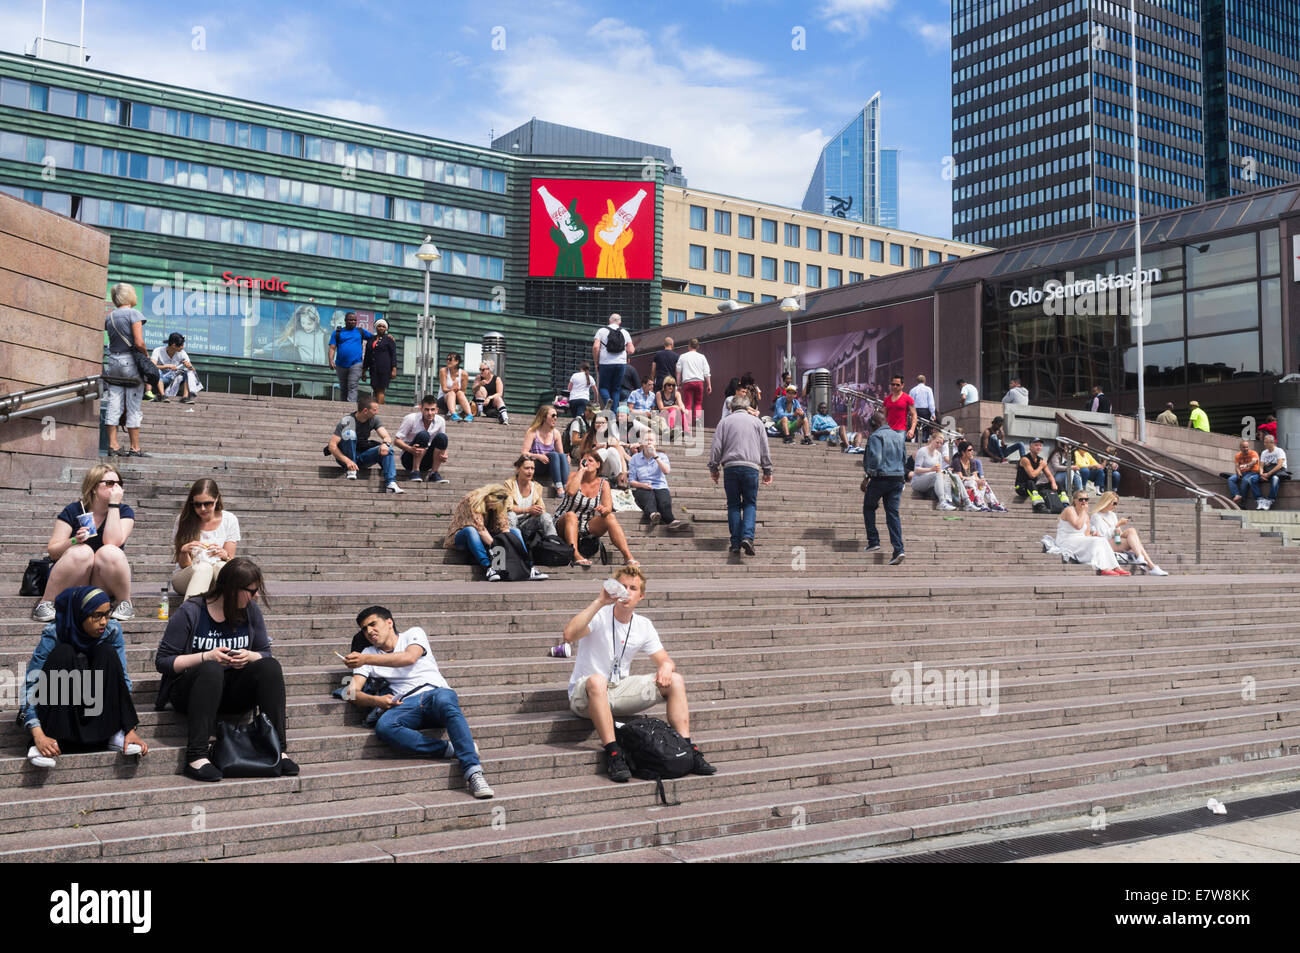 Jernbanetorget, Central Station square, Oslo, Norway - Stock Image